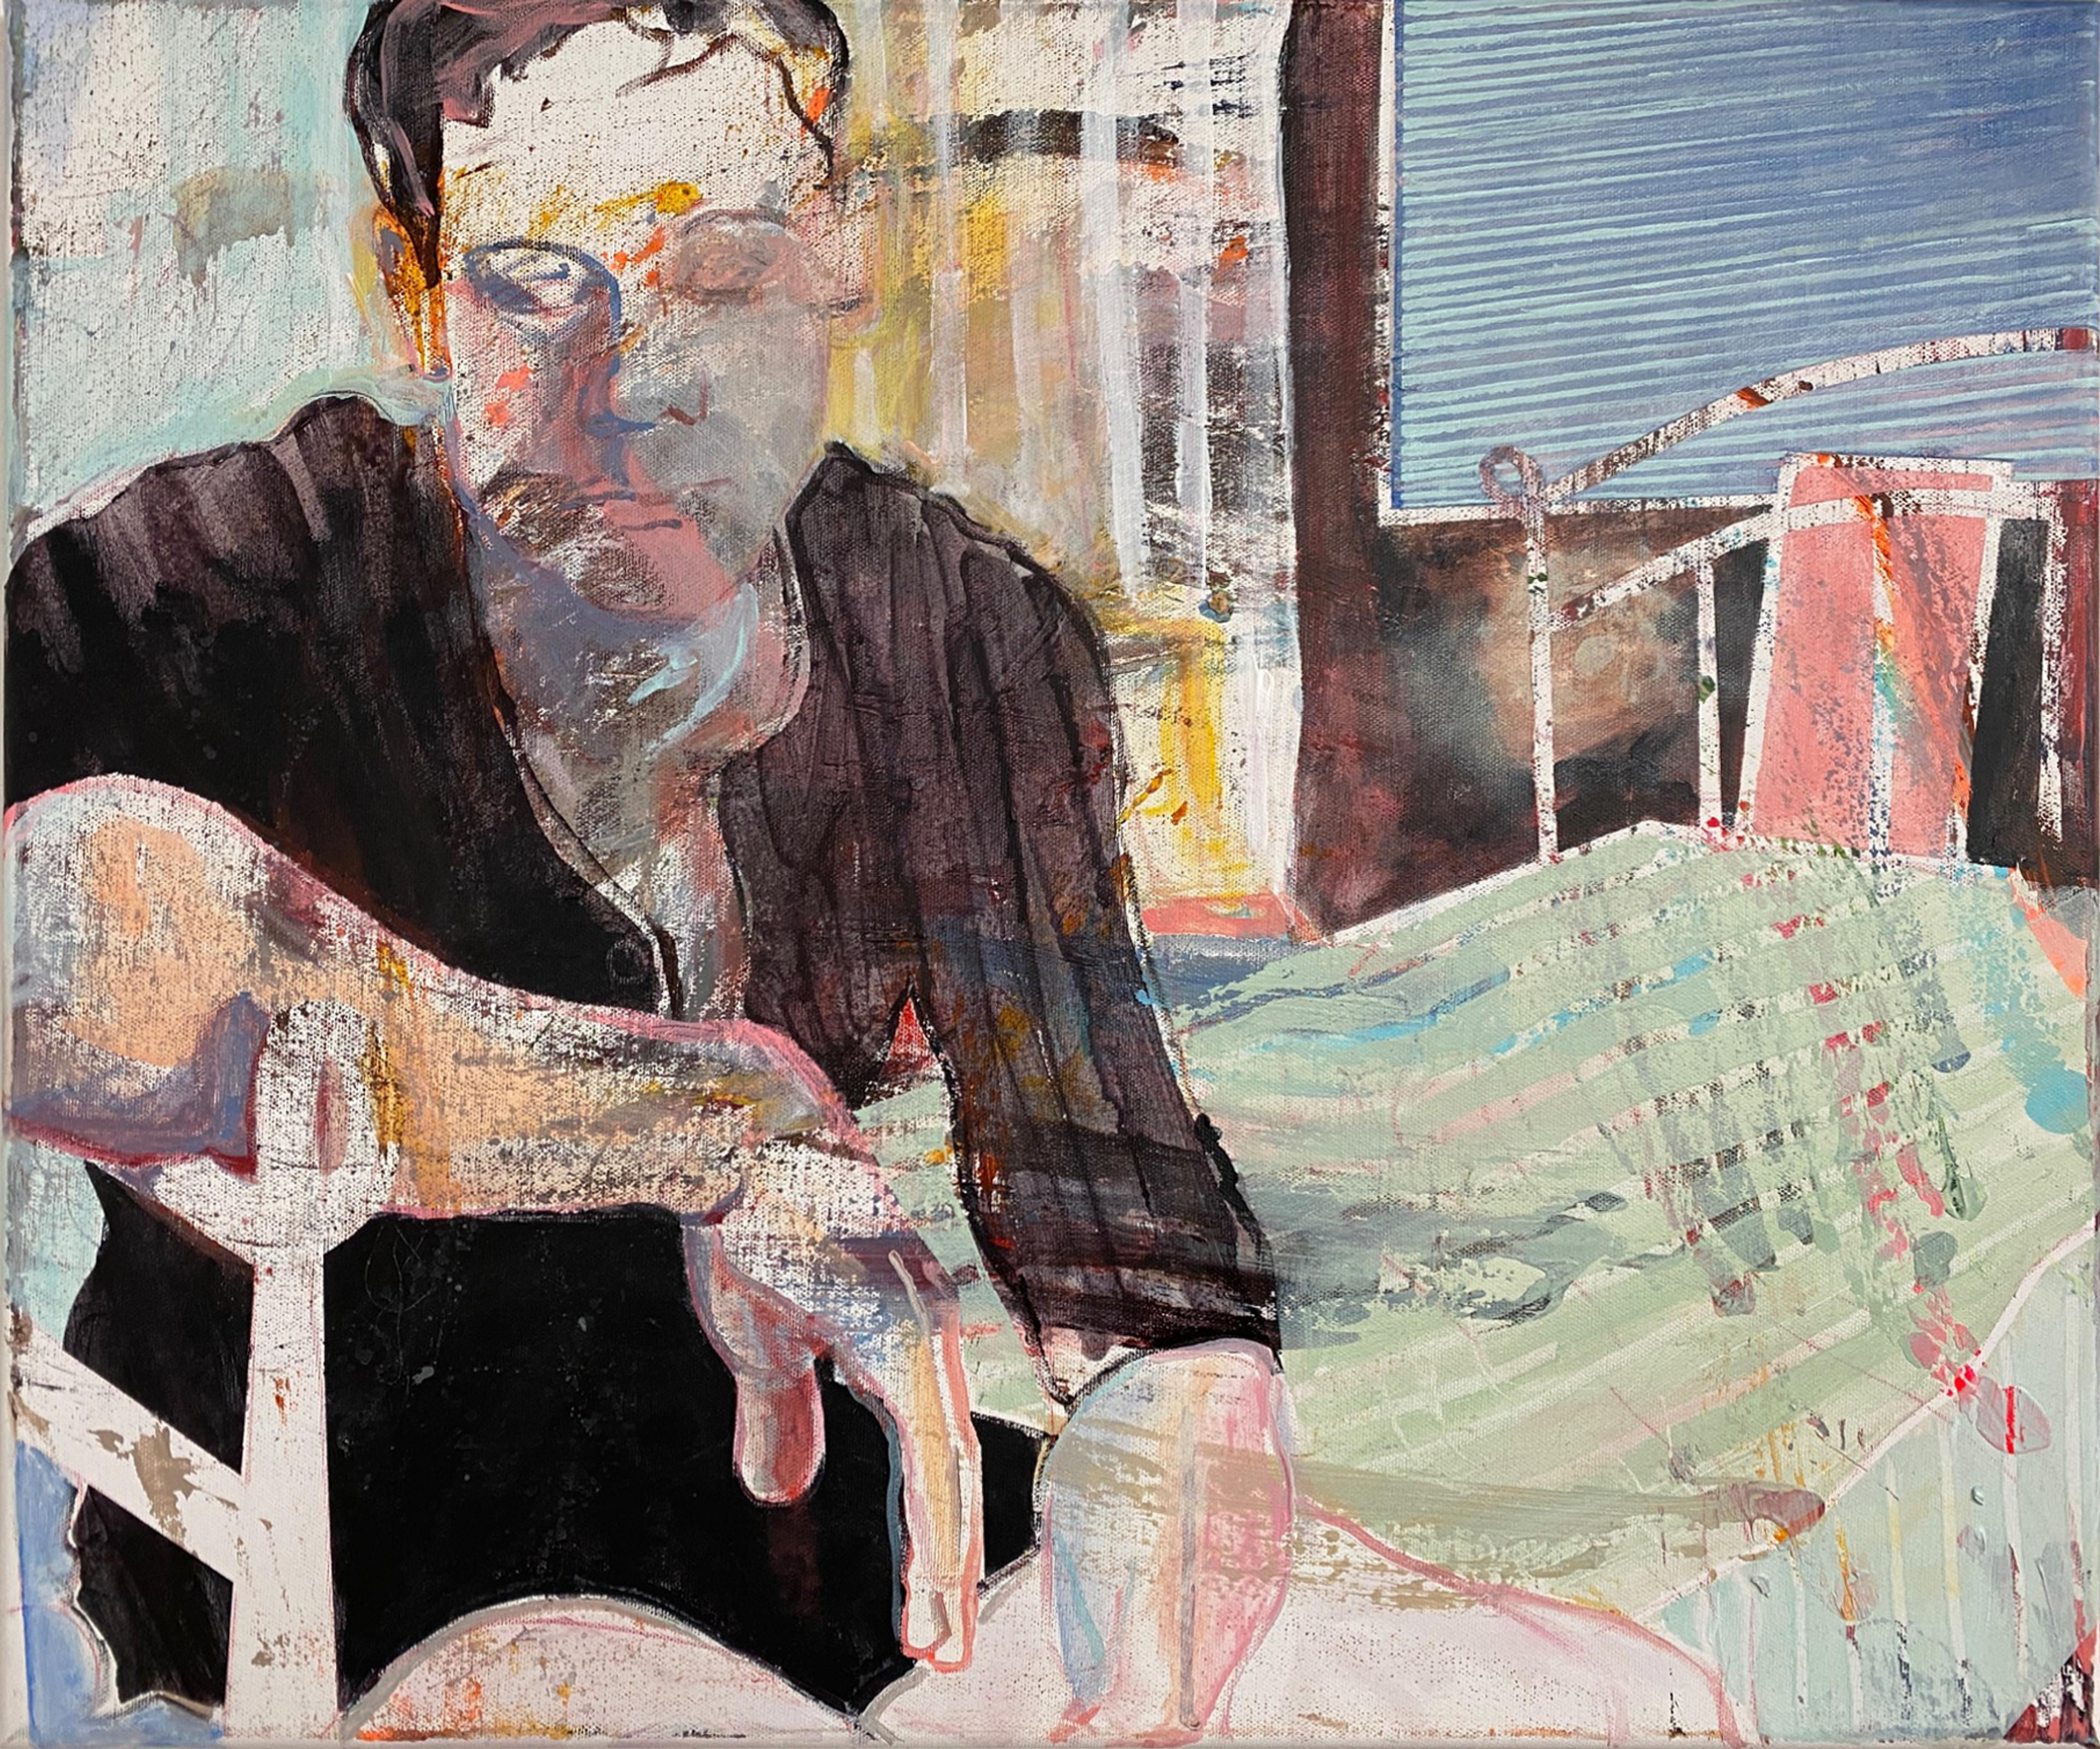 artwork another actor by Marlen Schulz